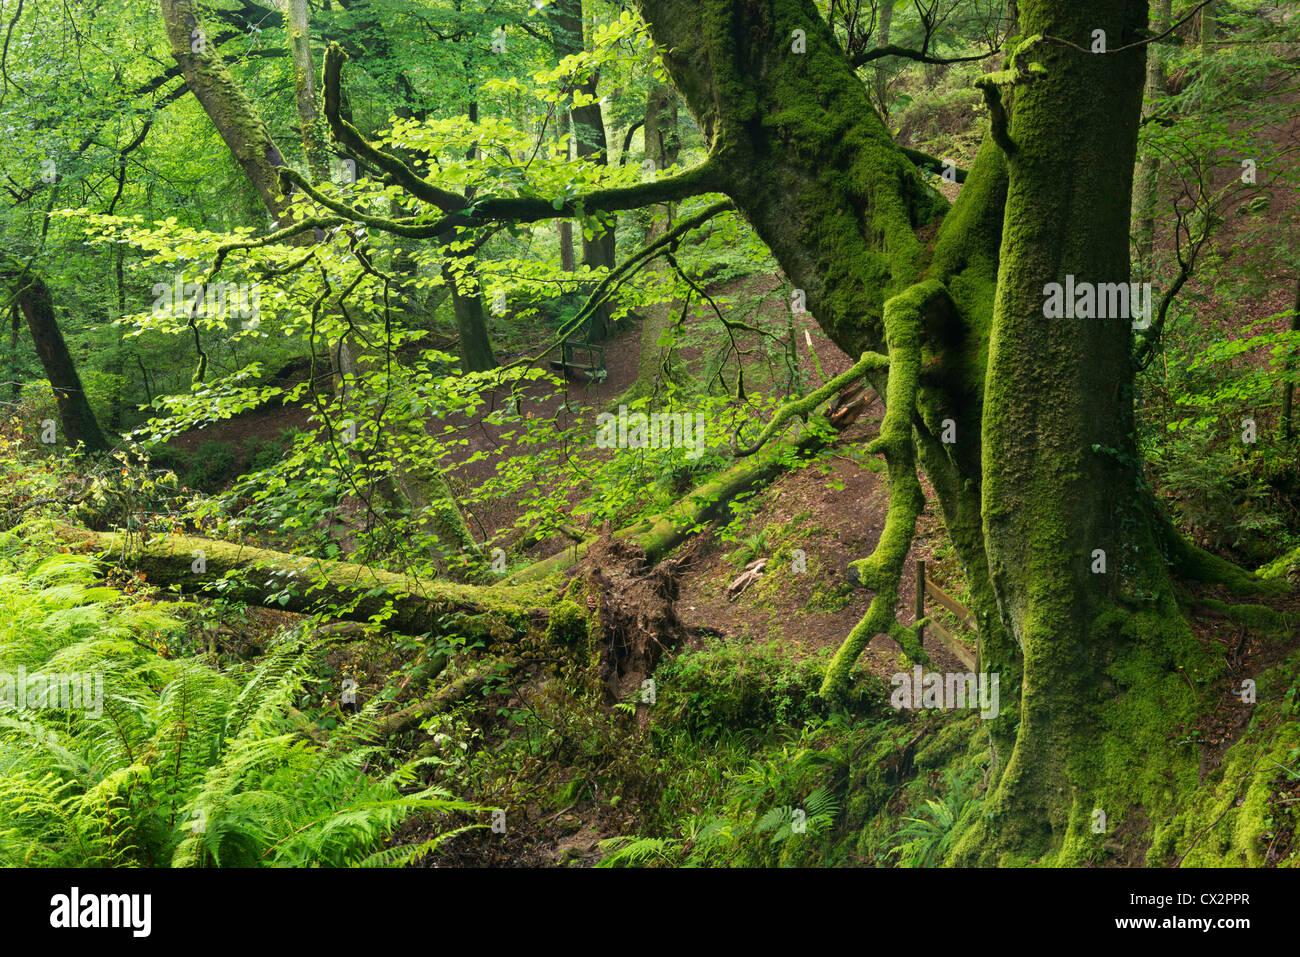 Summer green foliage in Buck's Valley Woods, Buck's Mills, Devon, England. August 2012. Stock Photo